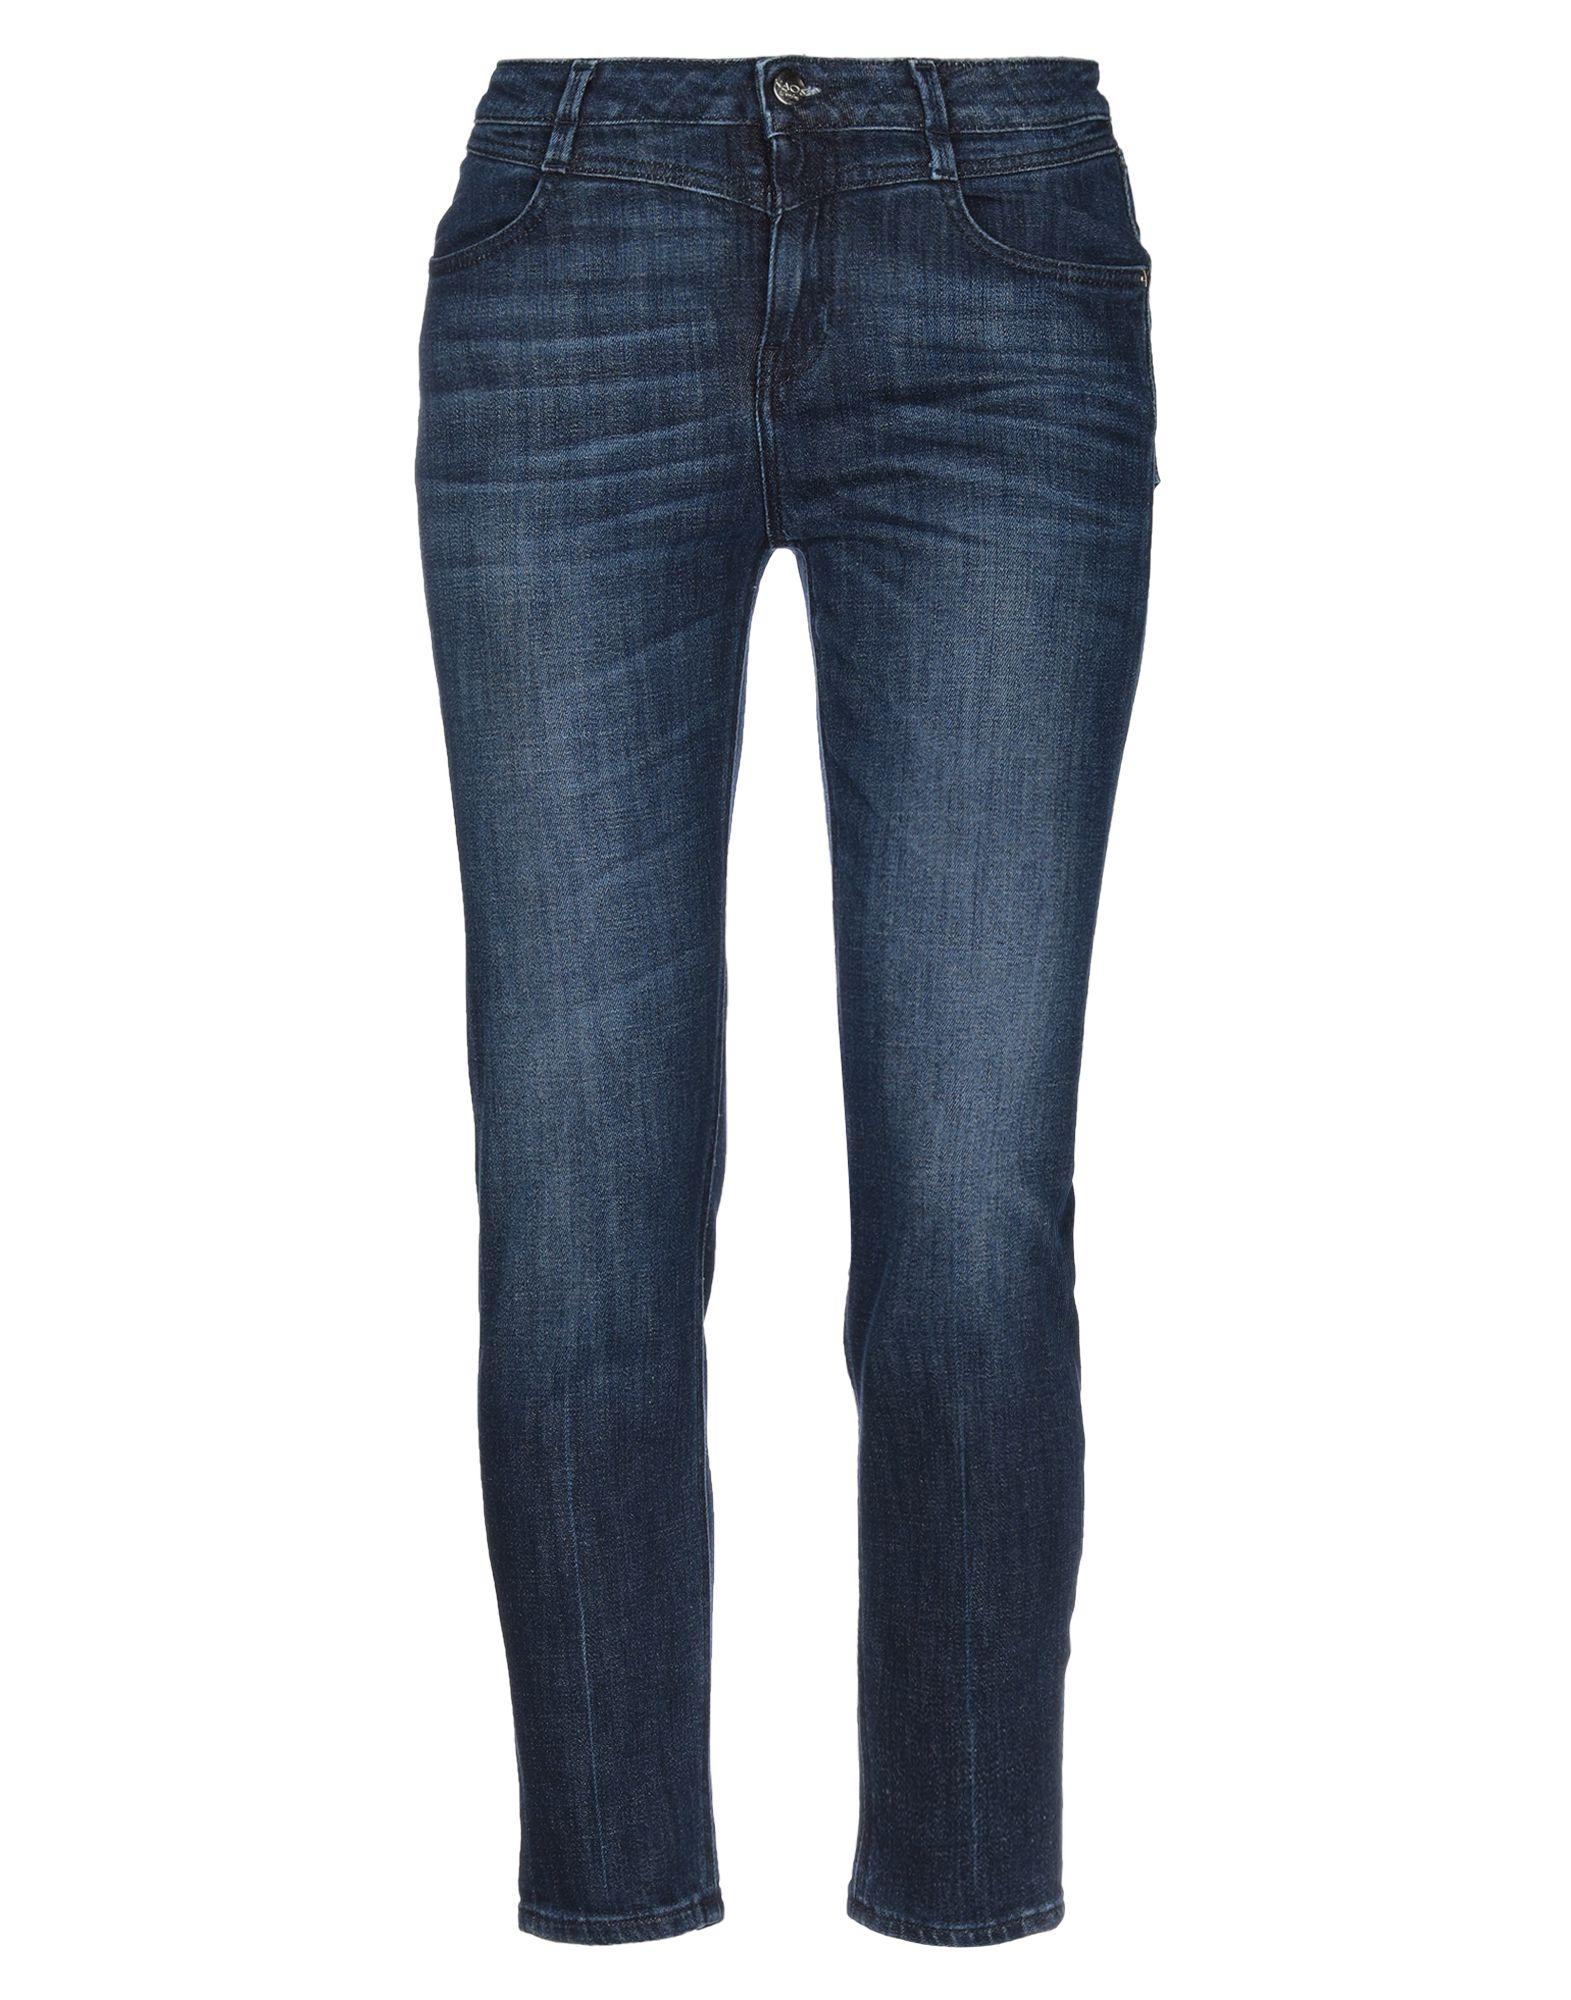 KAOS JEANS Denim pants - Item 42780325